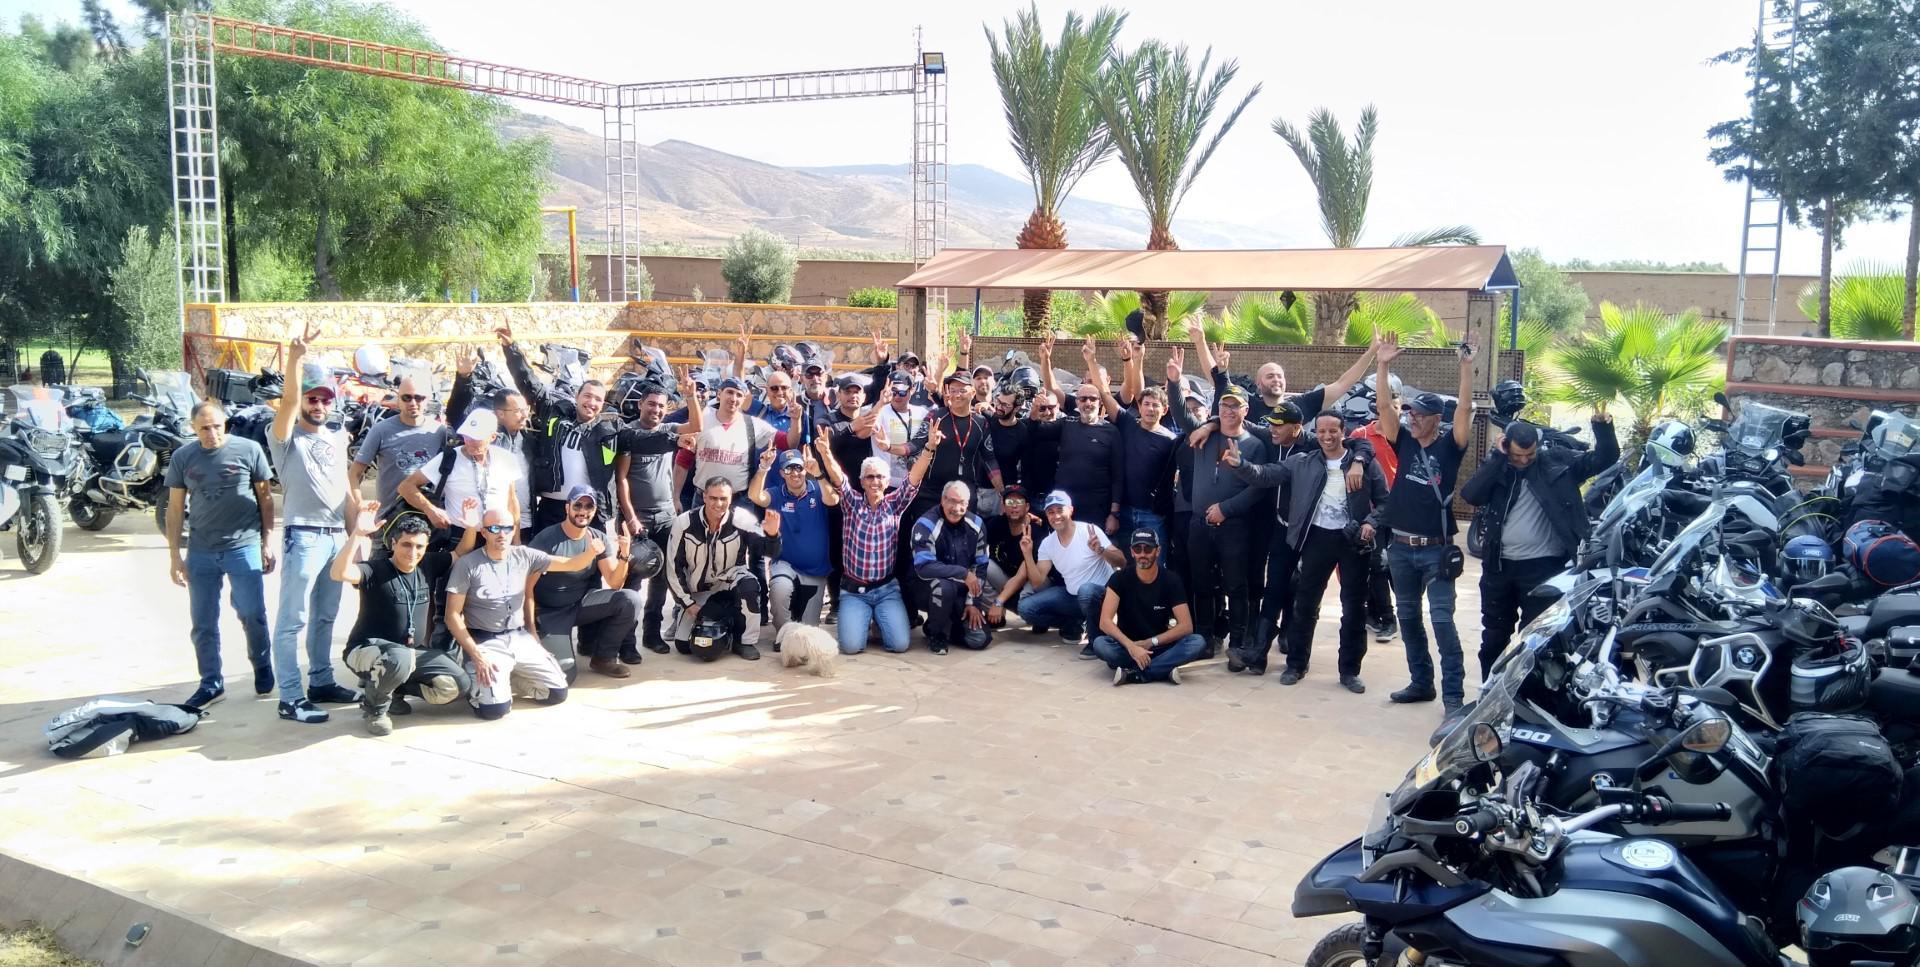 bwm-motorrad-morocco-iron-man-morocco-1143-5.jpg